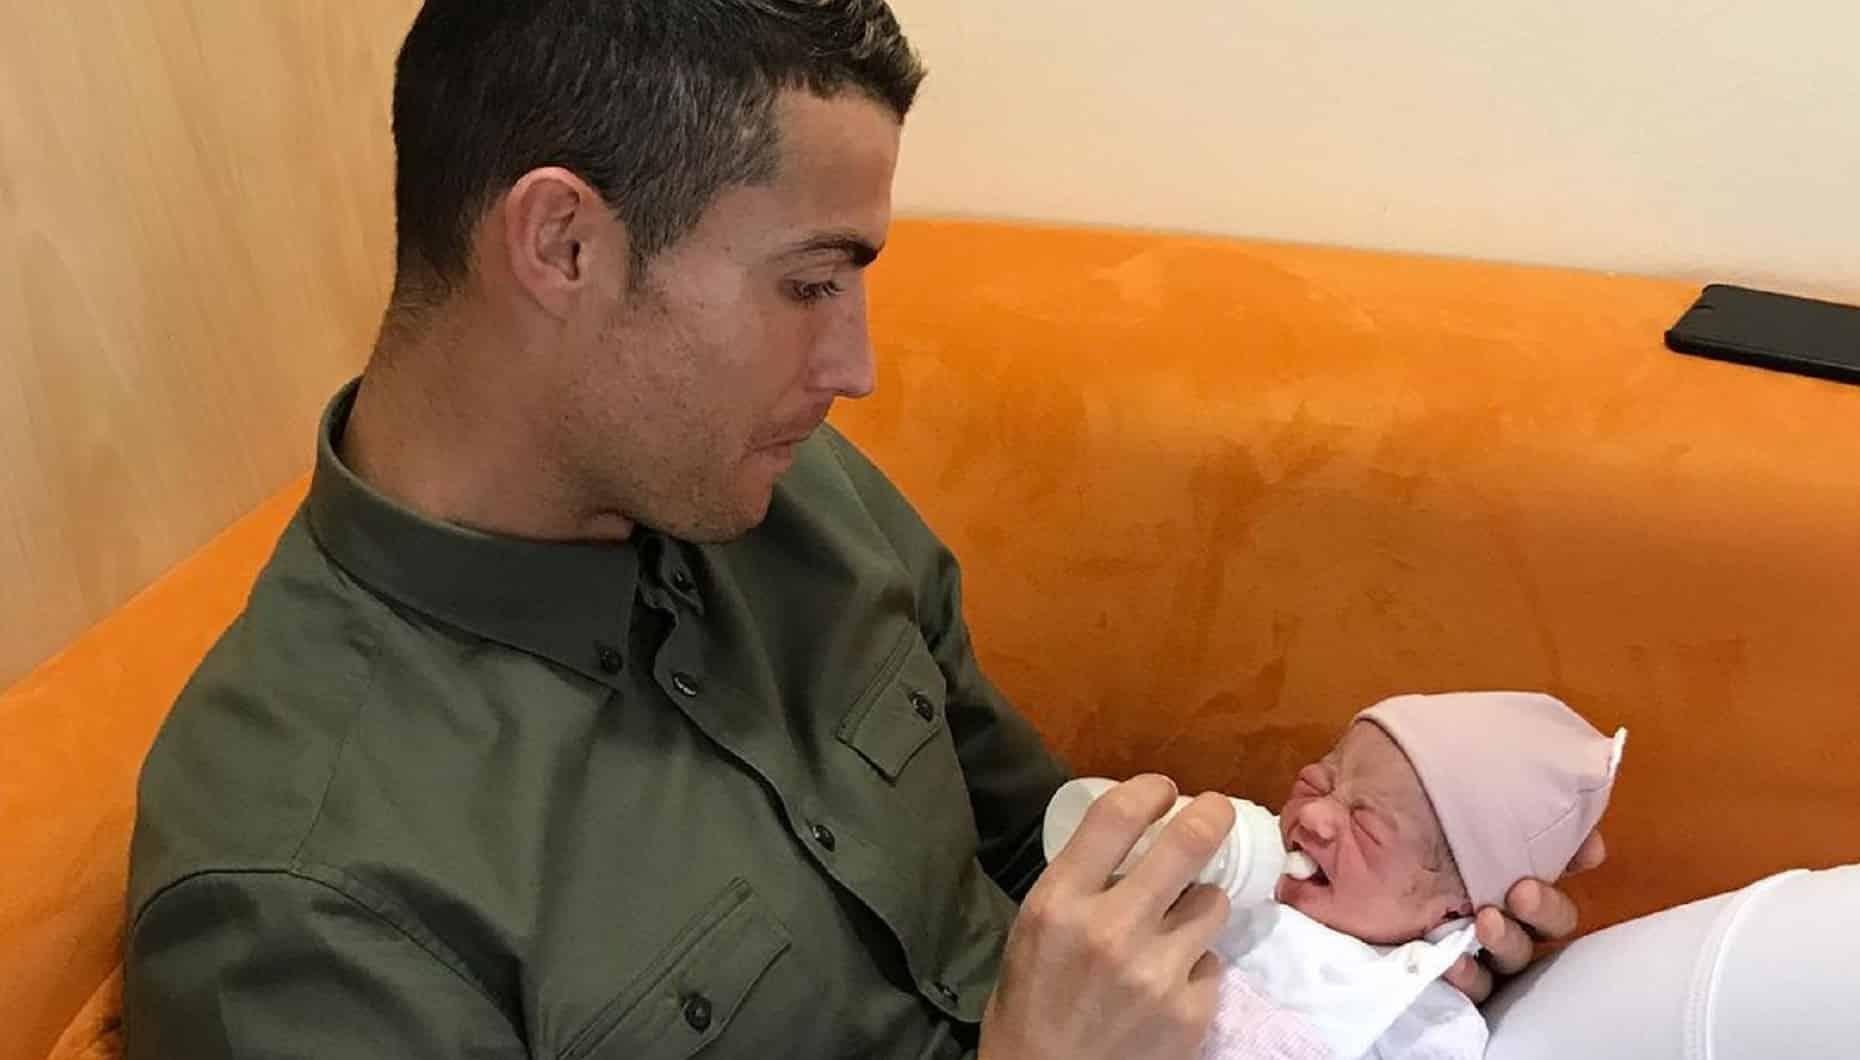 Cristiano Ronaldo, Filha Alana Martina